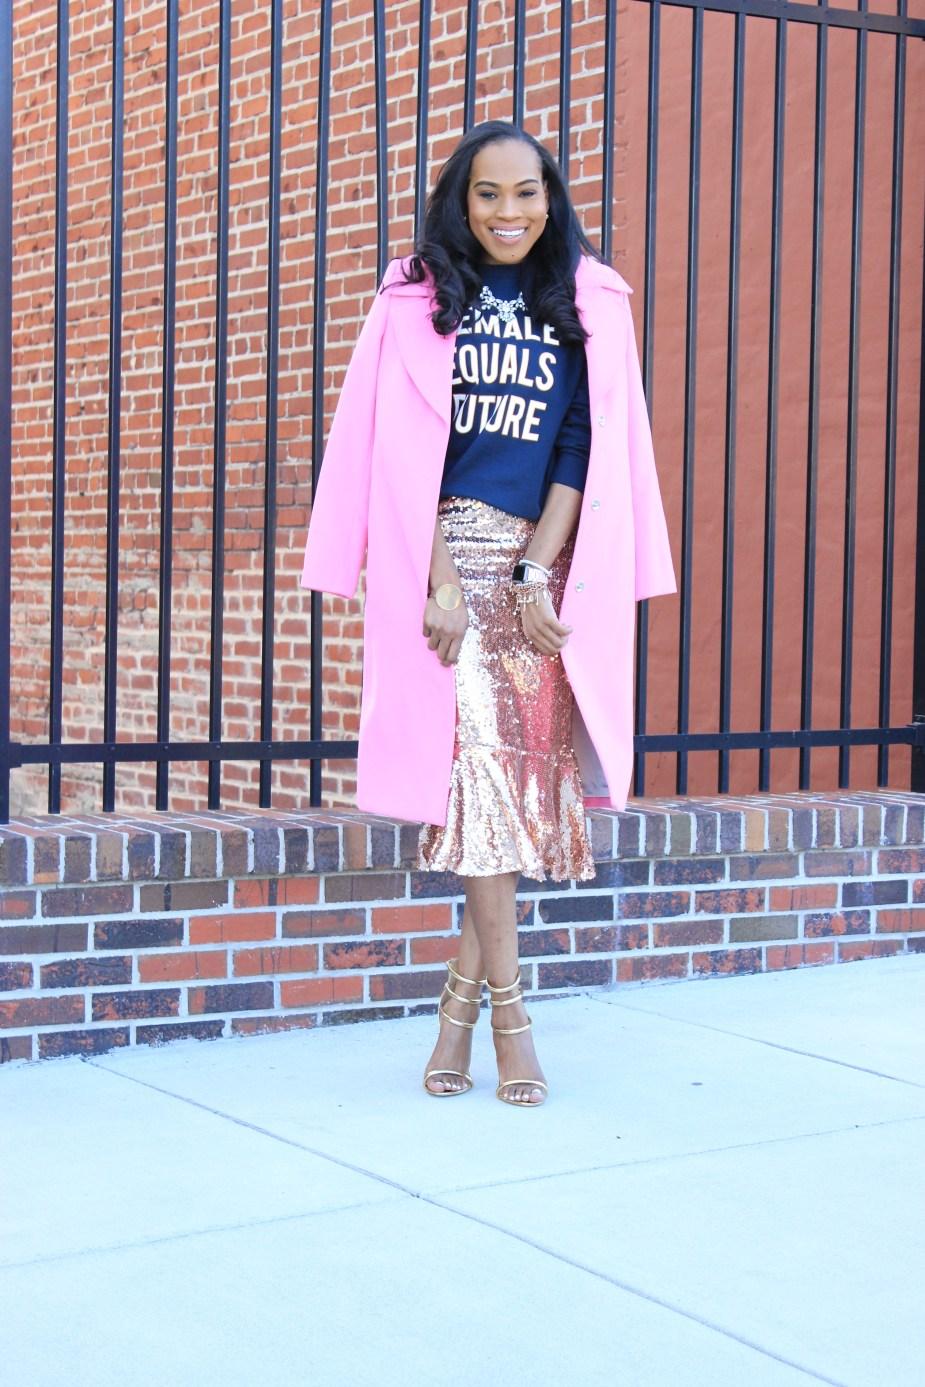 Style-Files-HM-Female-Equals-Future-Oversized-Sweatshirt-Boohoo-Rose-Gold-Sequin-Skirt-Trumpet-Hem-boohoo-Jasmine- Sequin-Ruffle-Hem-Midi Skirt-Public-Desire-Aisha-Gold-Strappy-Heeled- Sandals-Miss-Selfridge-Tailored-Hot-Pink-Jacket-oohlalablog-10